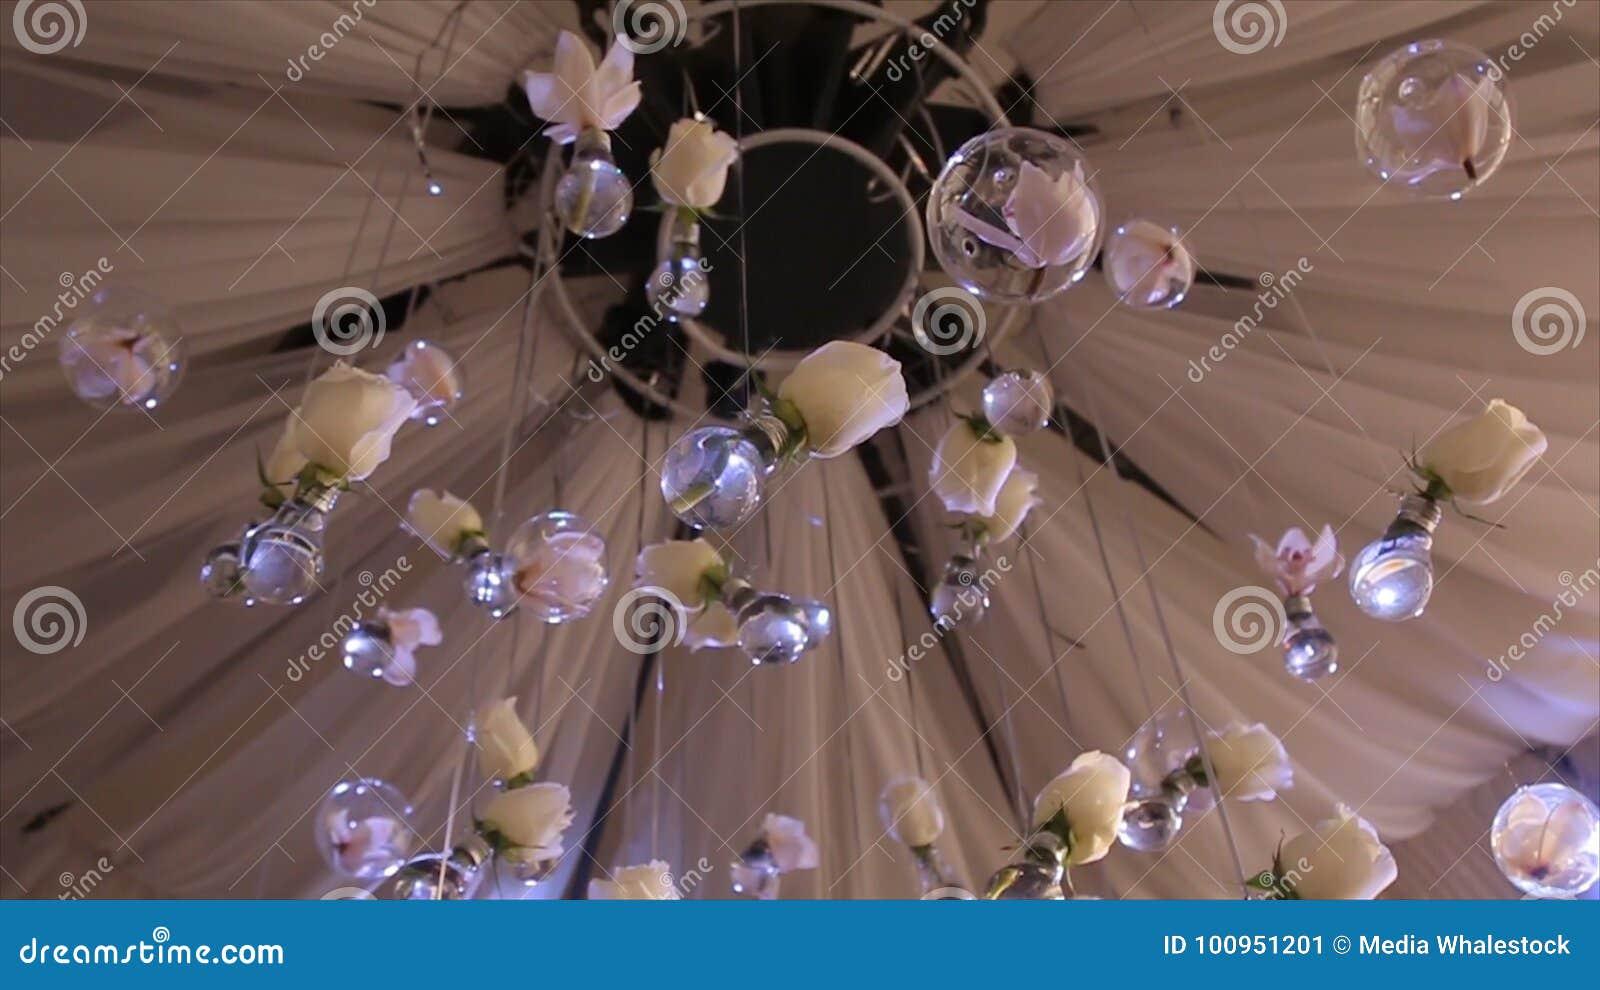 Lighting Decor Bulb Glass Beads Glass Beads Are Hanging On